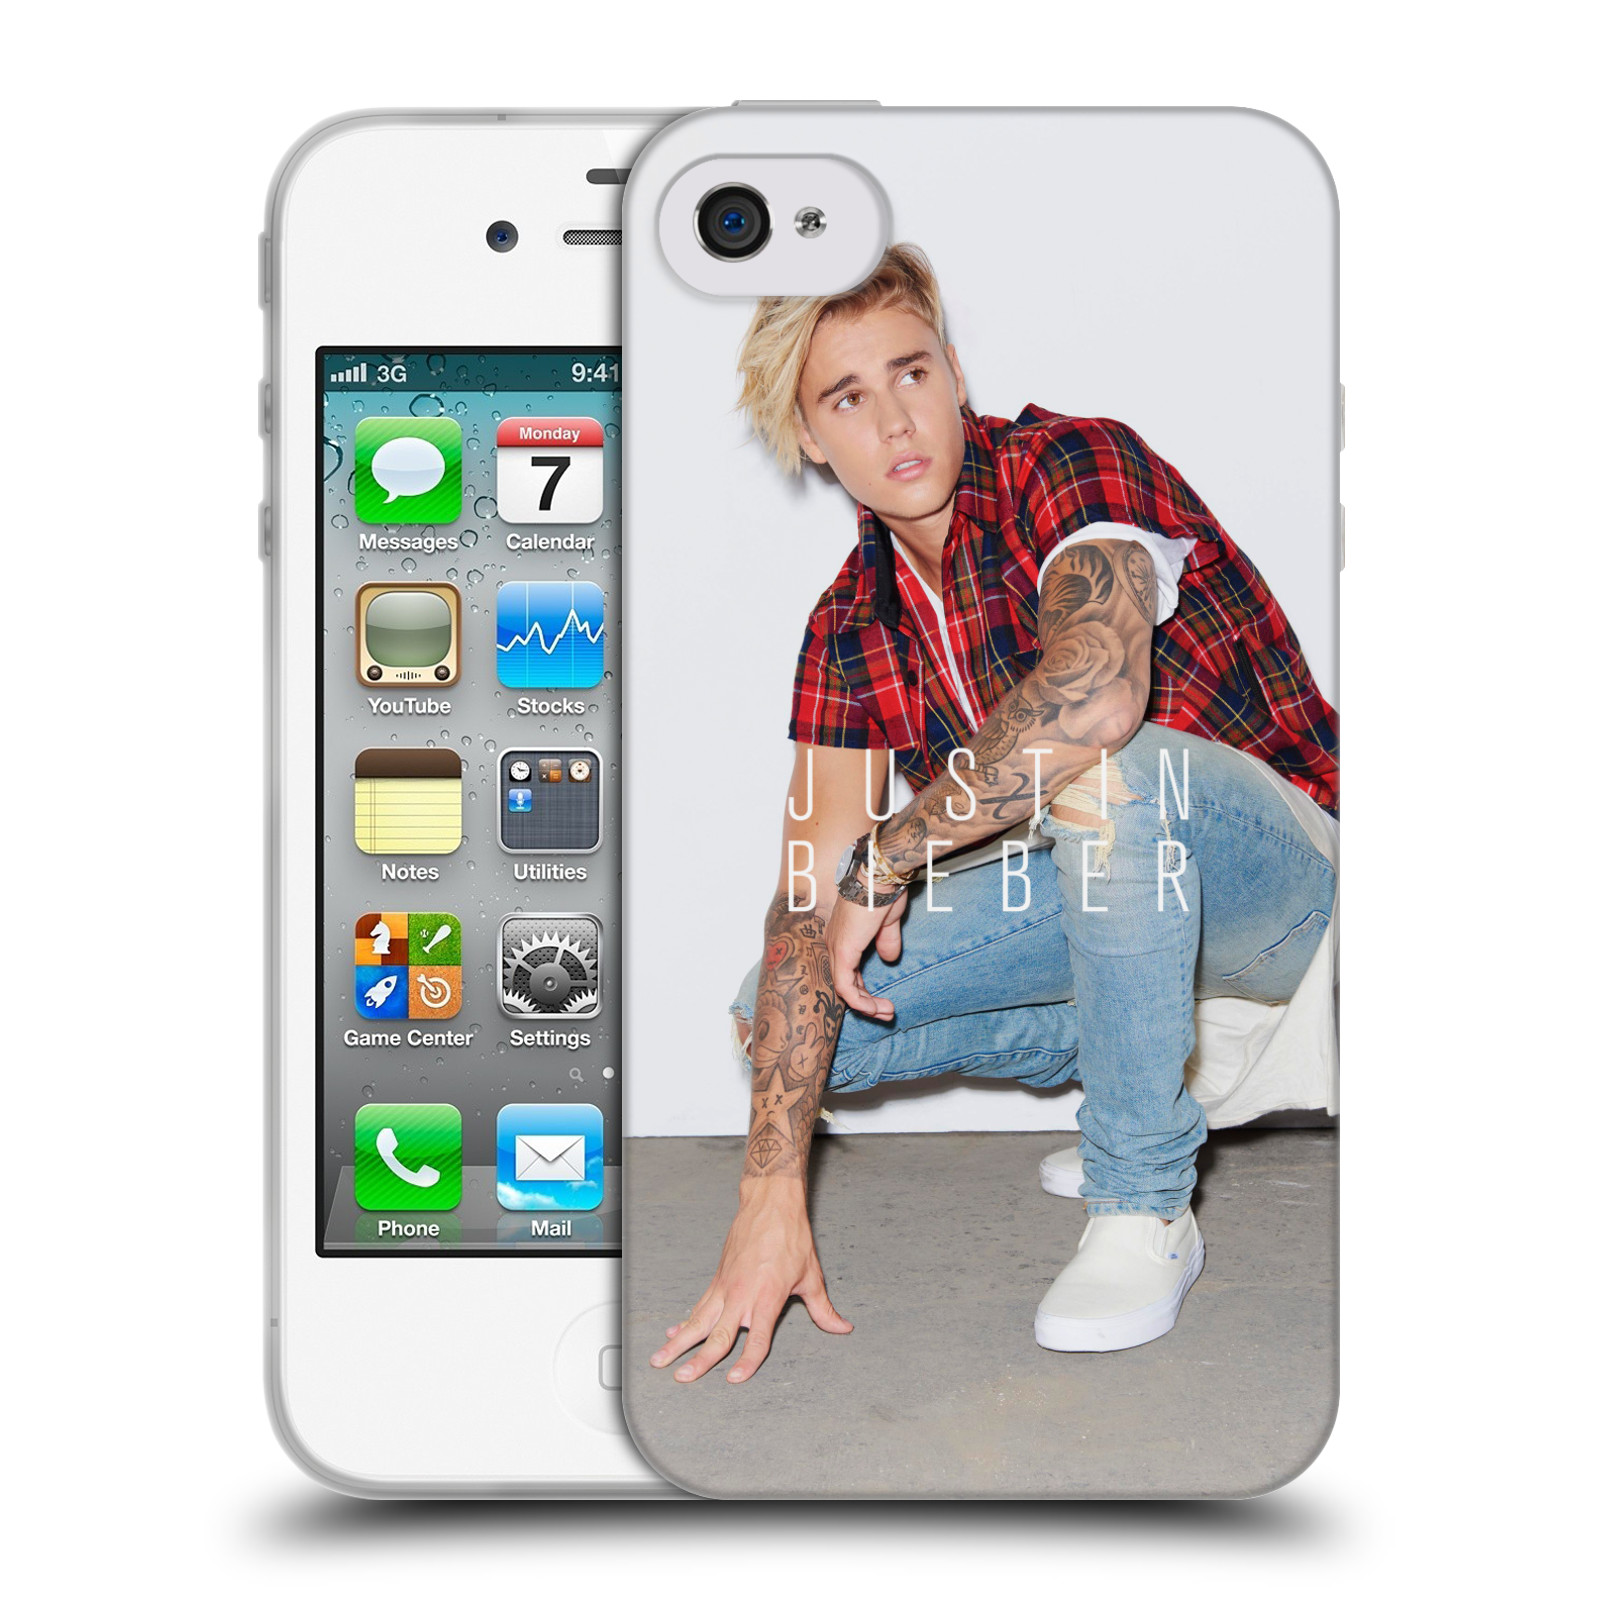 HEAD CASE silikonový obal na mobil Apple Iphone 4 / 4S originální potisk Justin Bieber Uncropped